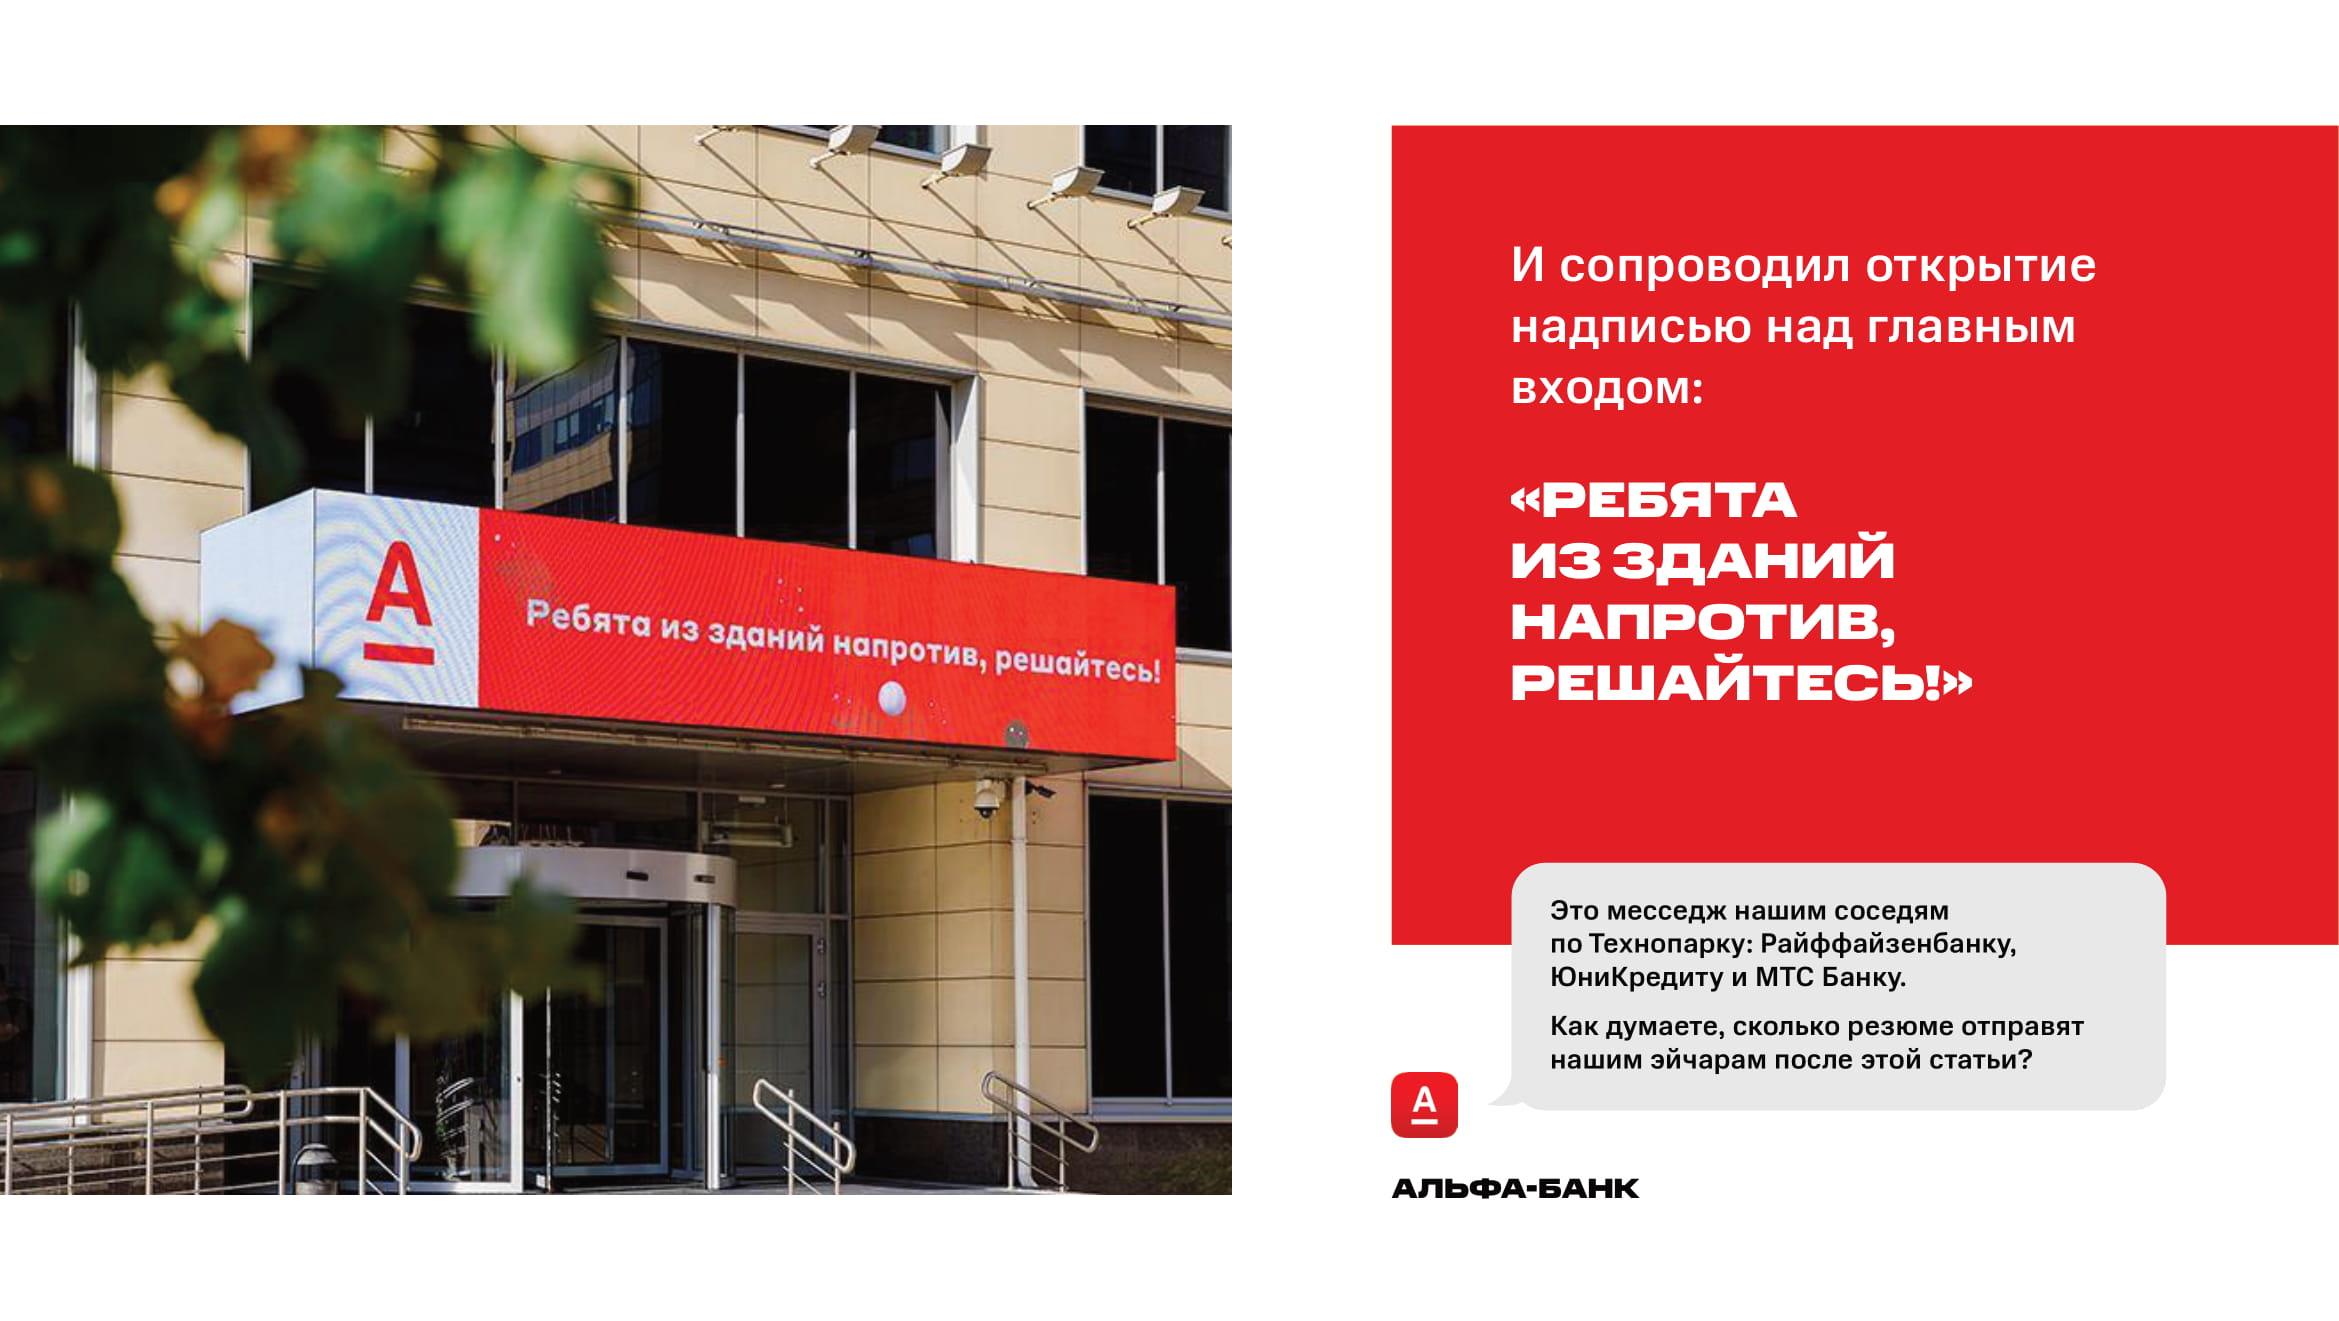 RFA_Креатив-года-2020_МТС-Банк-VS-Альфа-Банк-04